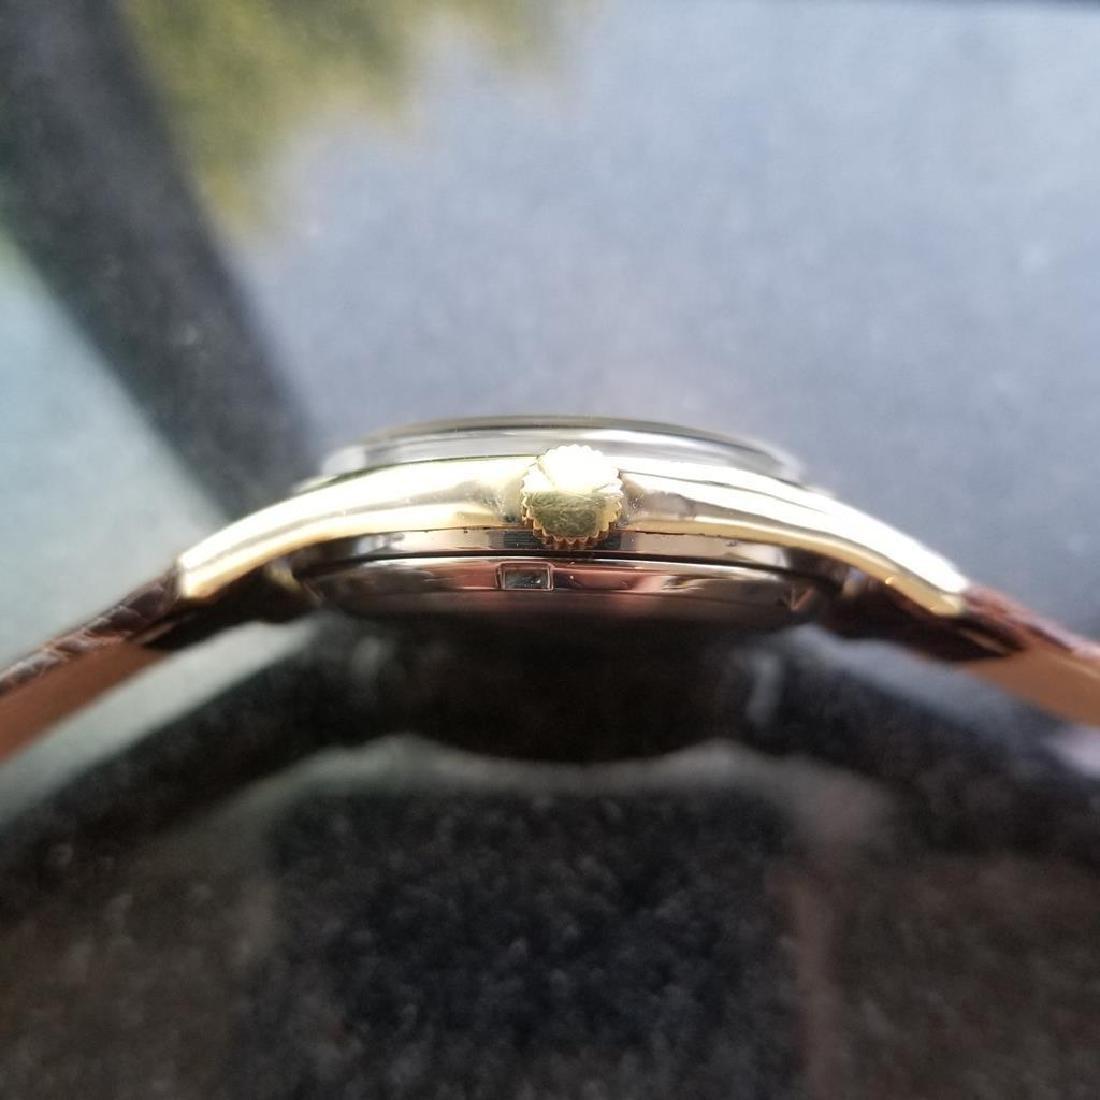 Vintage ULYSSE NARDIN Chronometer Automatic w/ date - 7